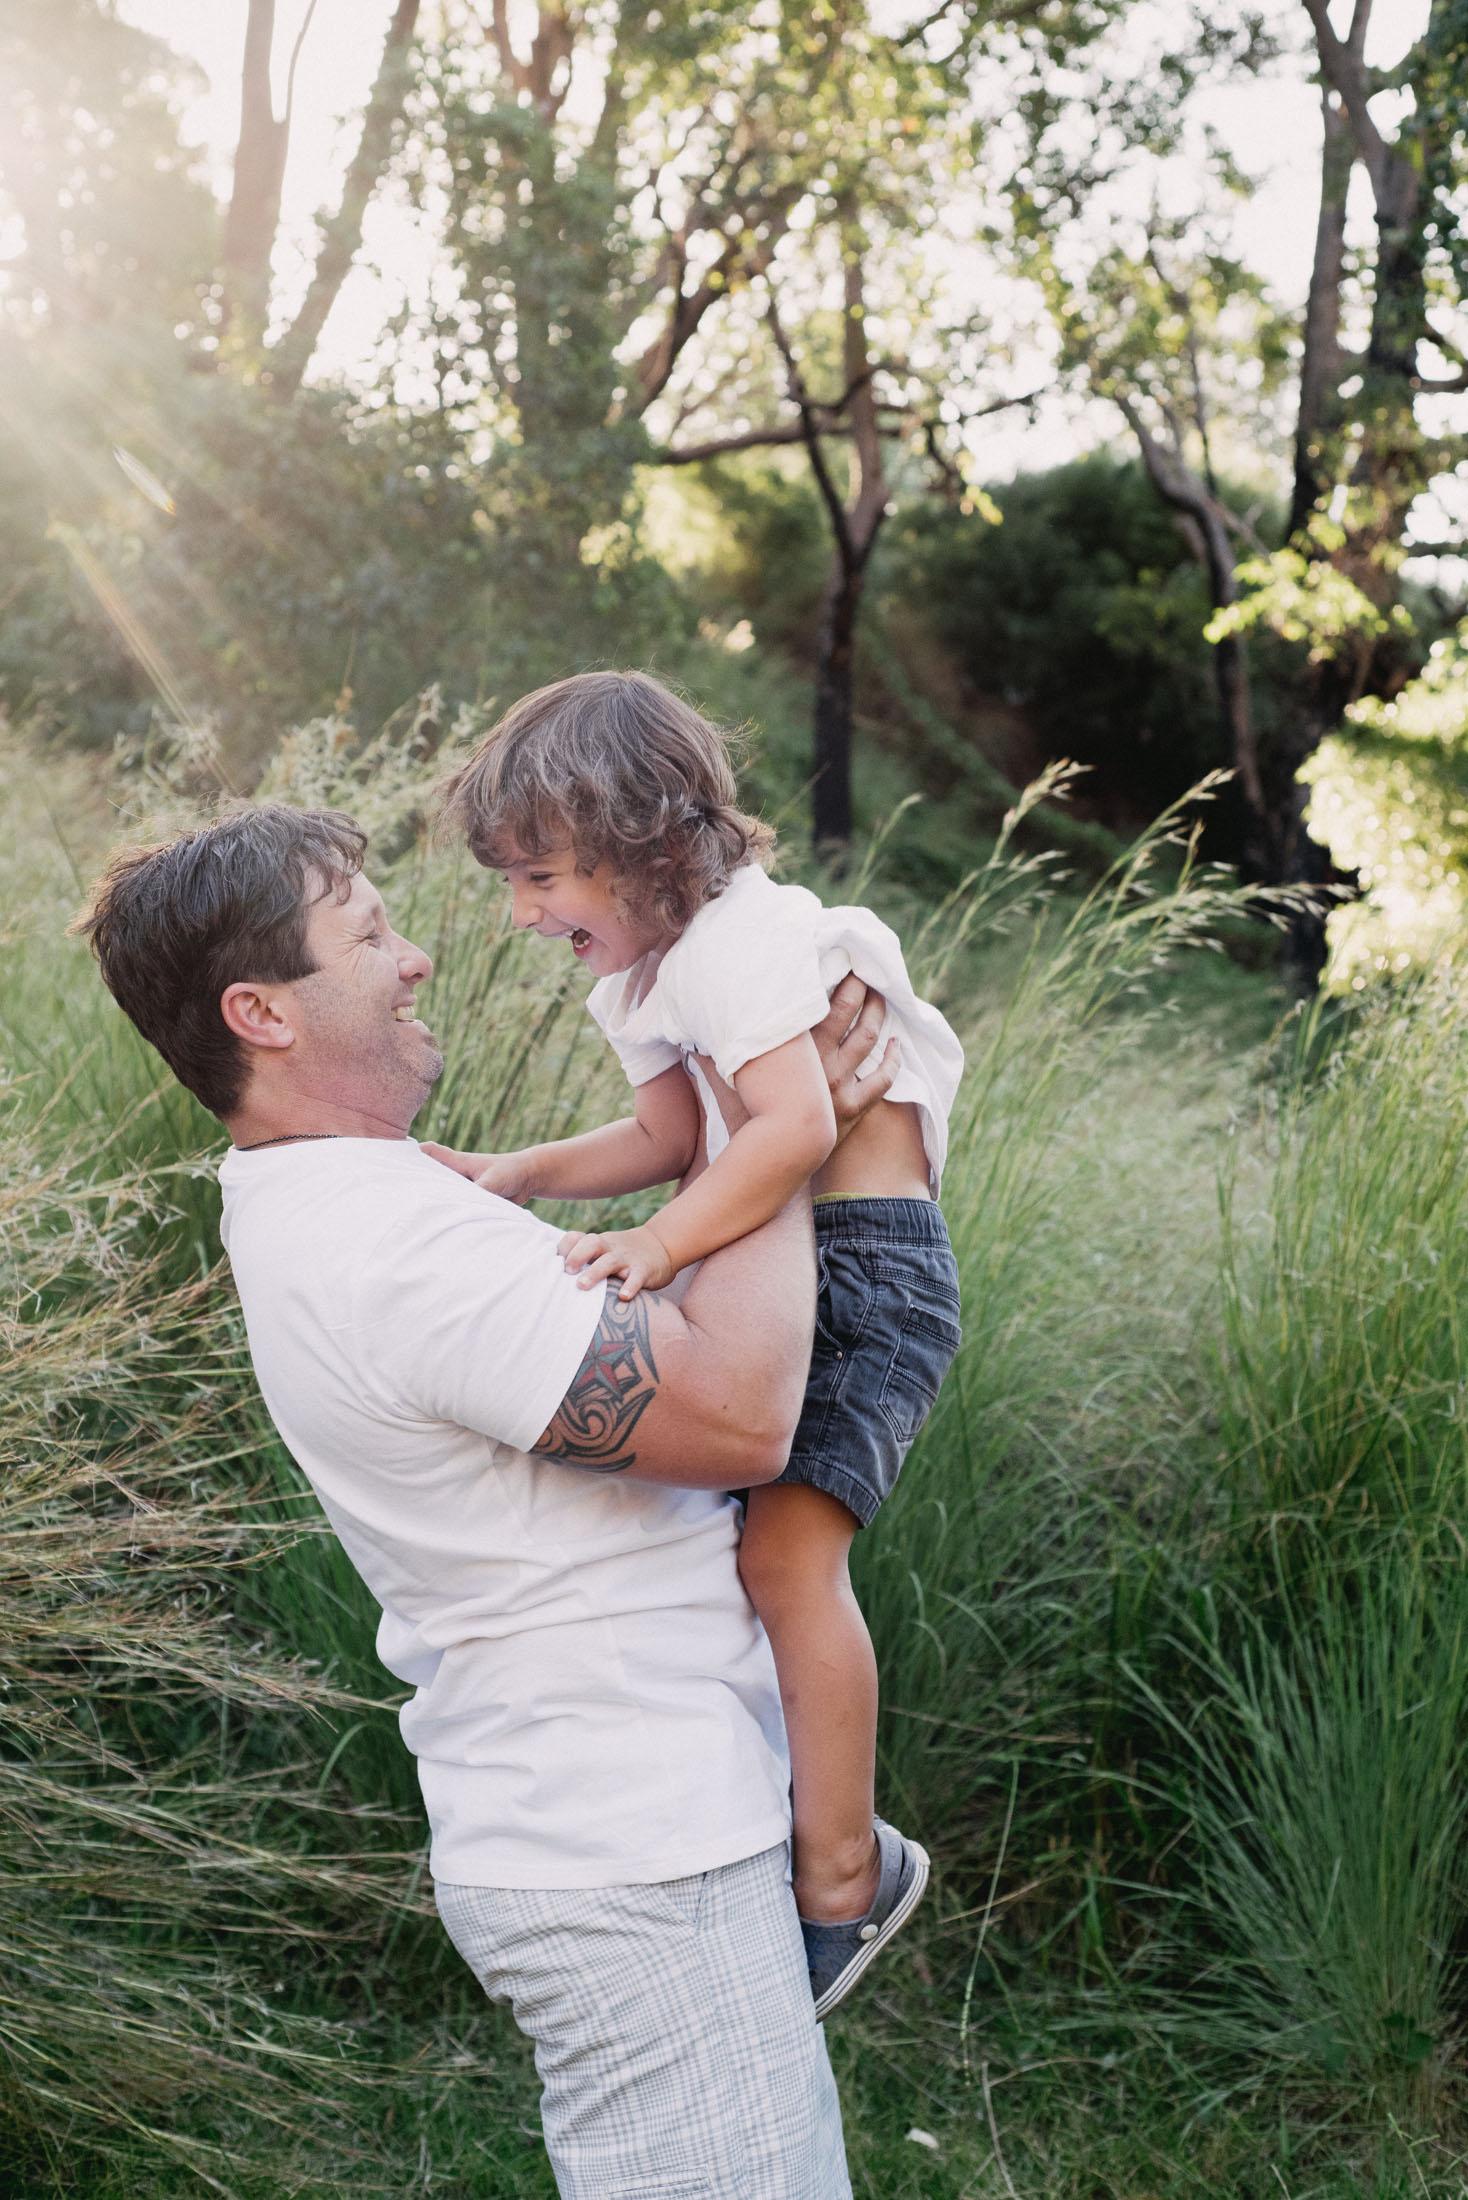 Popa_Family-Photography-unposed21.JPG